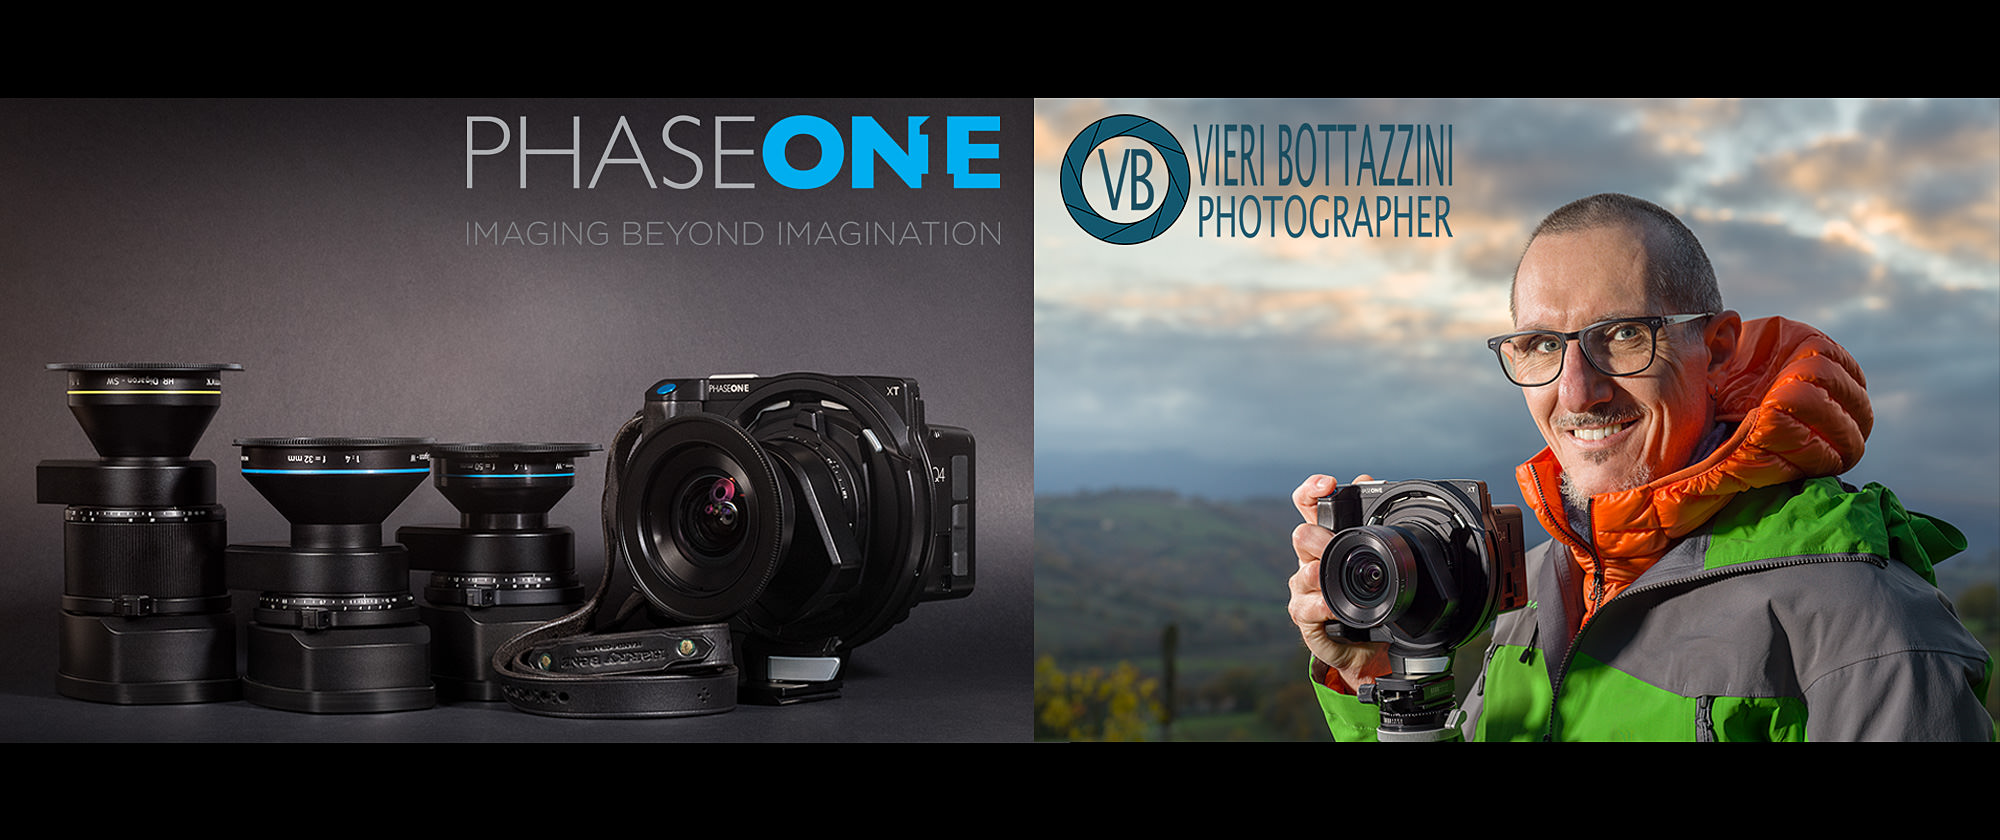 Vieri Bottazzini is a proud PhaseOne Local Ambassador